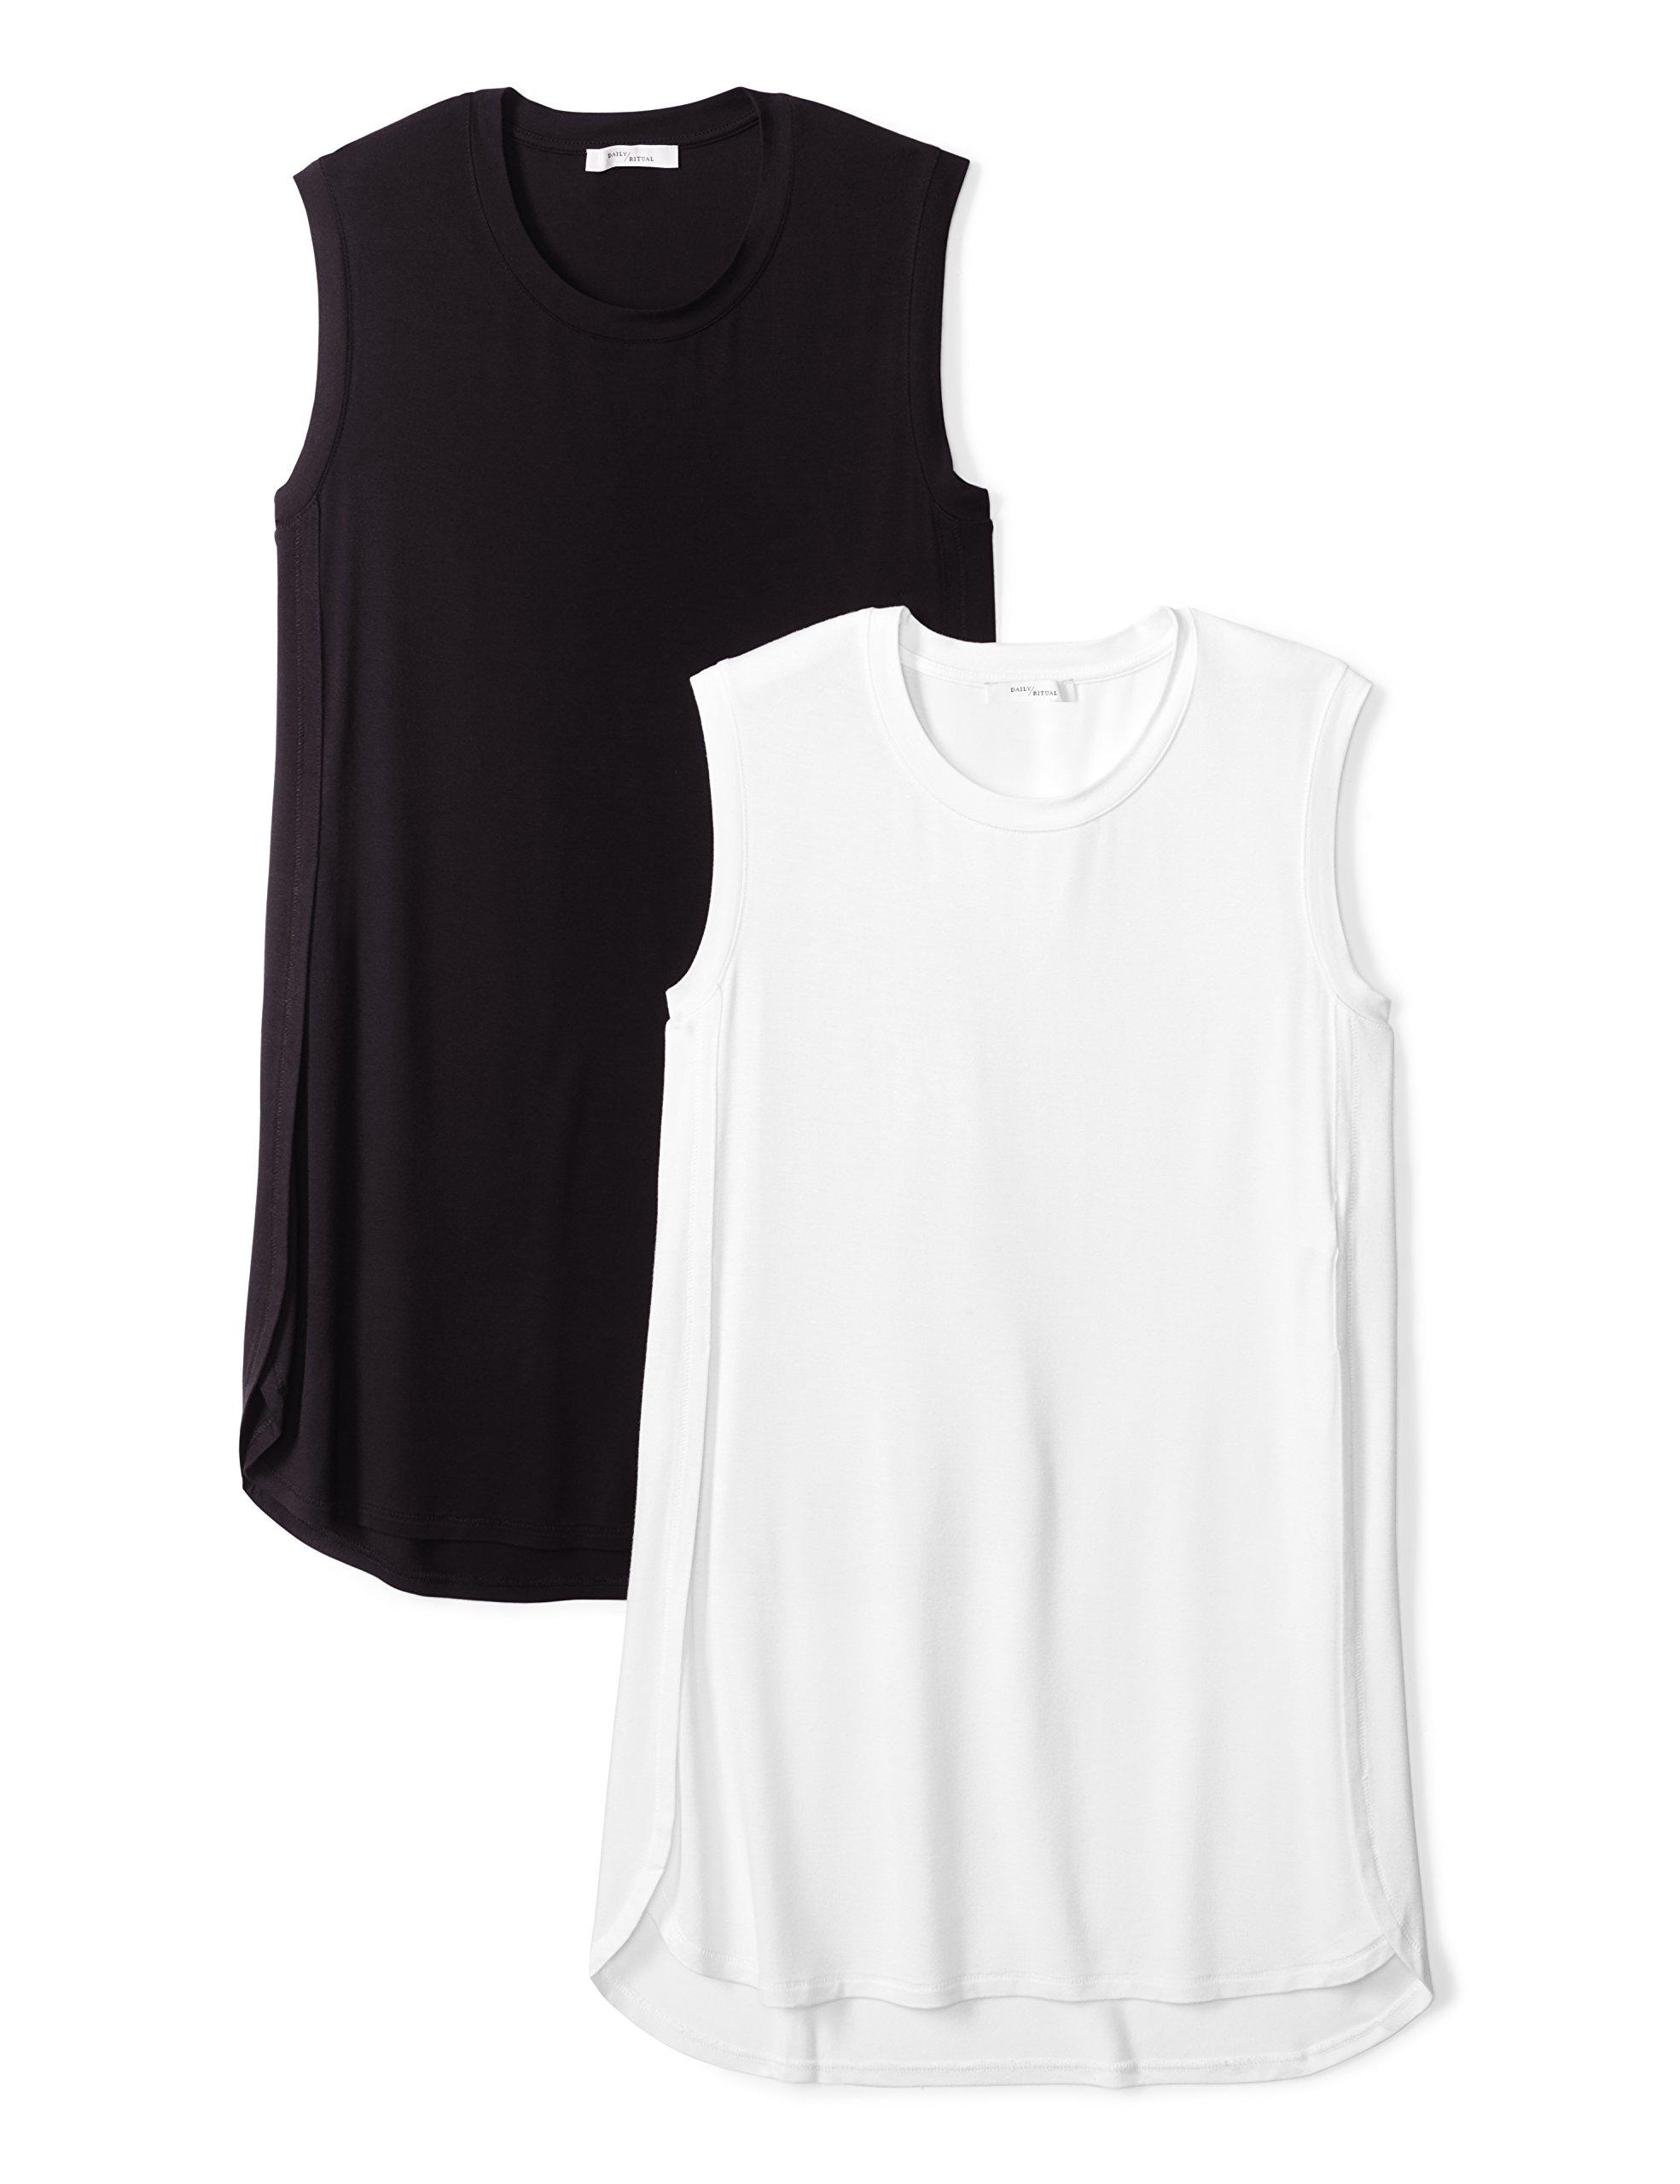 Daily Ritual Women's Jersey Sleeveless Tunic, 2-Pack, M, Black/White